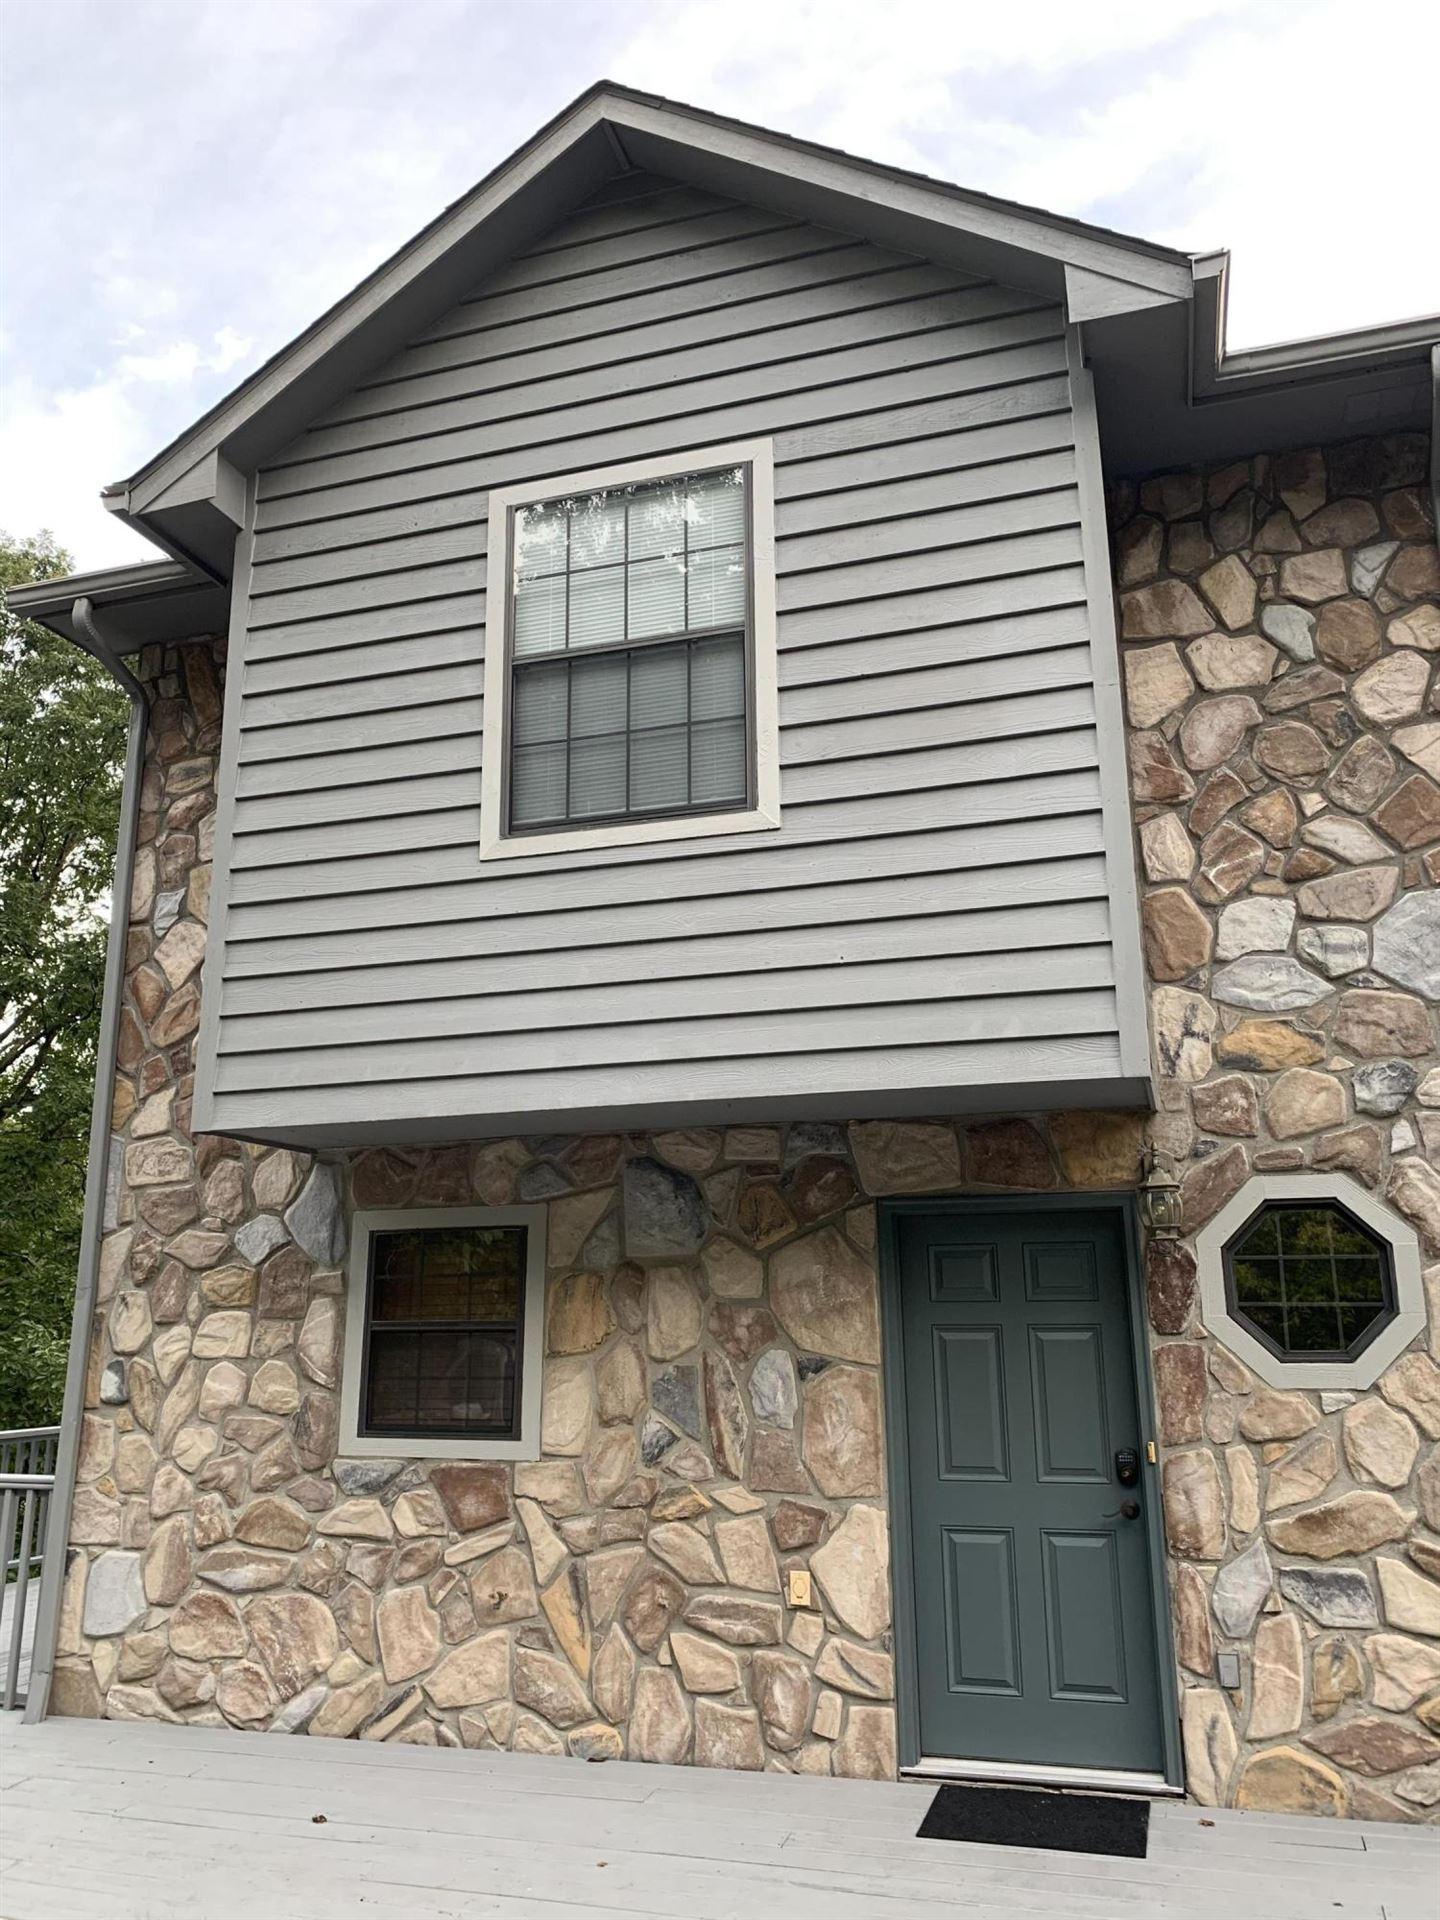 Photo for 1635-1 Cove Pt Rd #1, LaFollette, TN 37766 (MLS # 1128749)